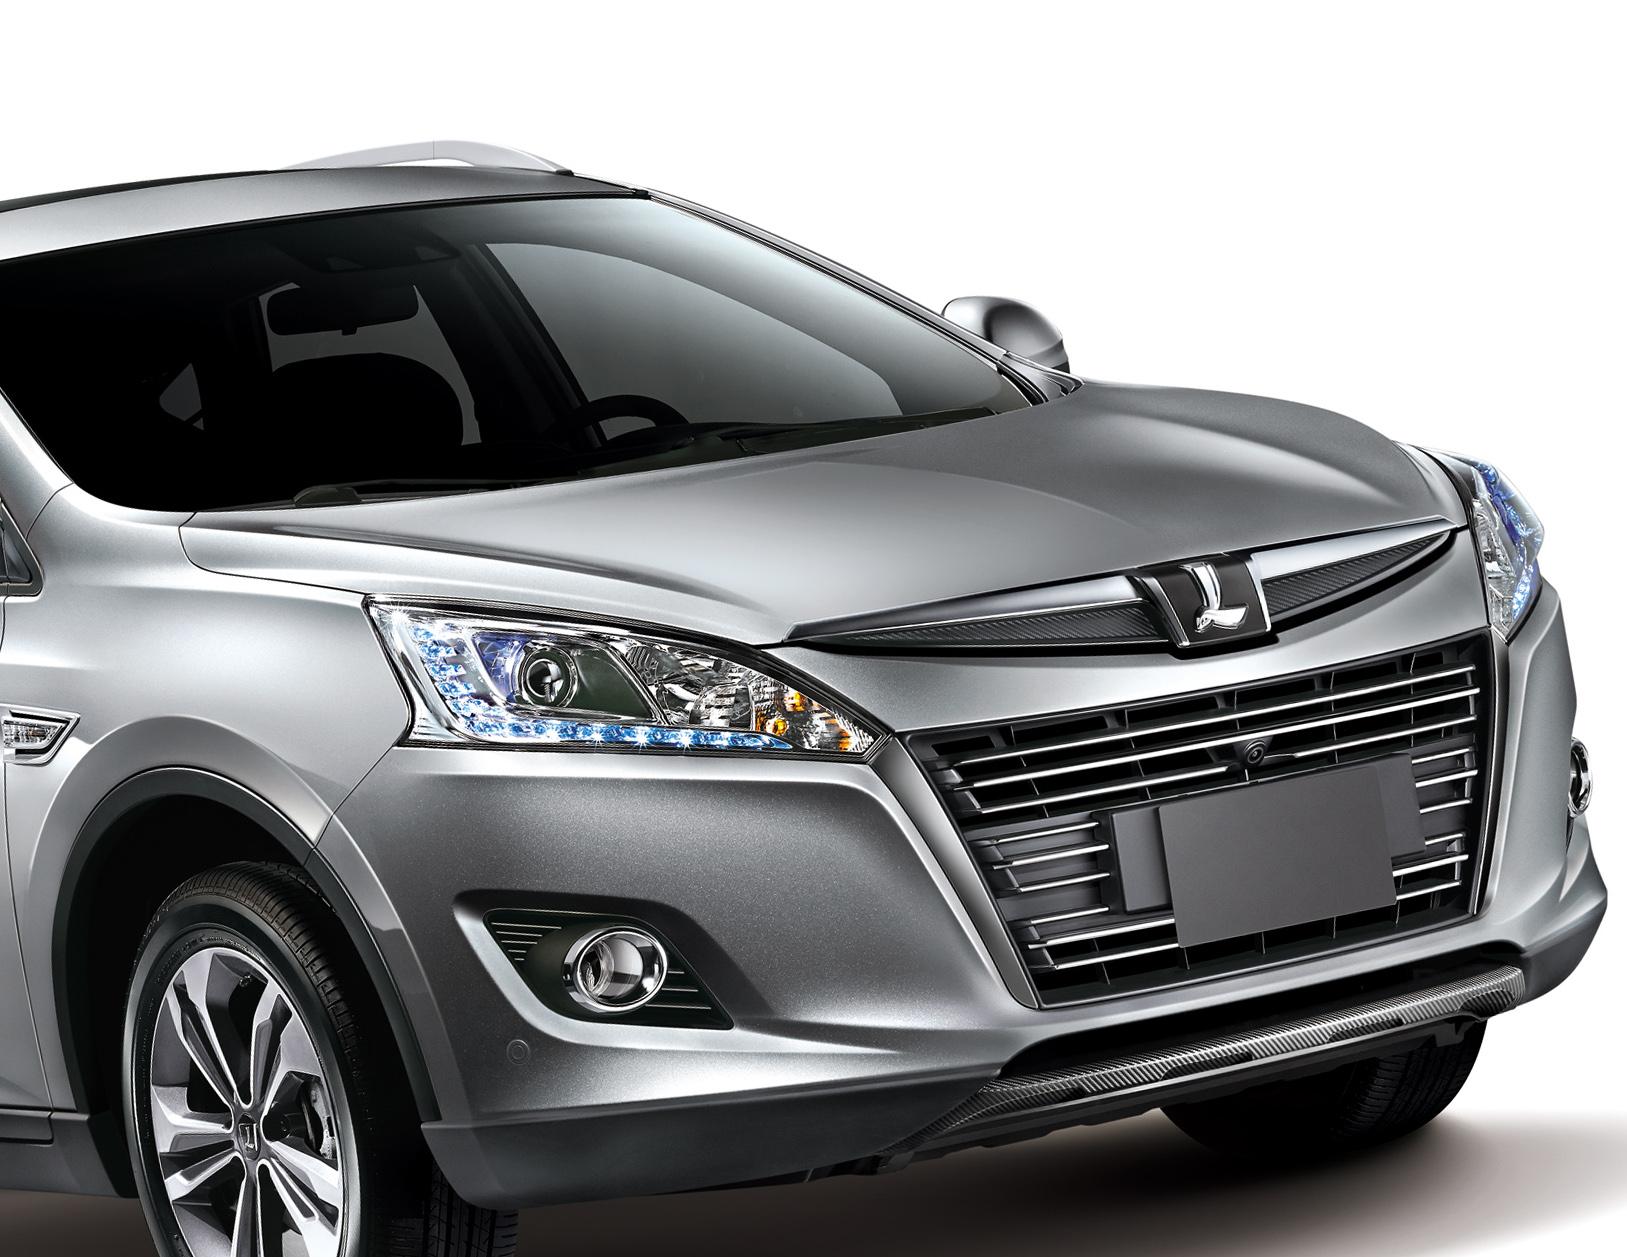 LUXGEN全新中型 SUV即將登場,TURBO渦輪增壓動力與智慧型安全科技絕對少不了!